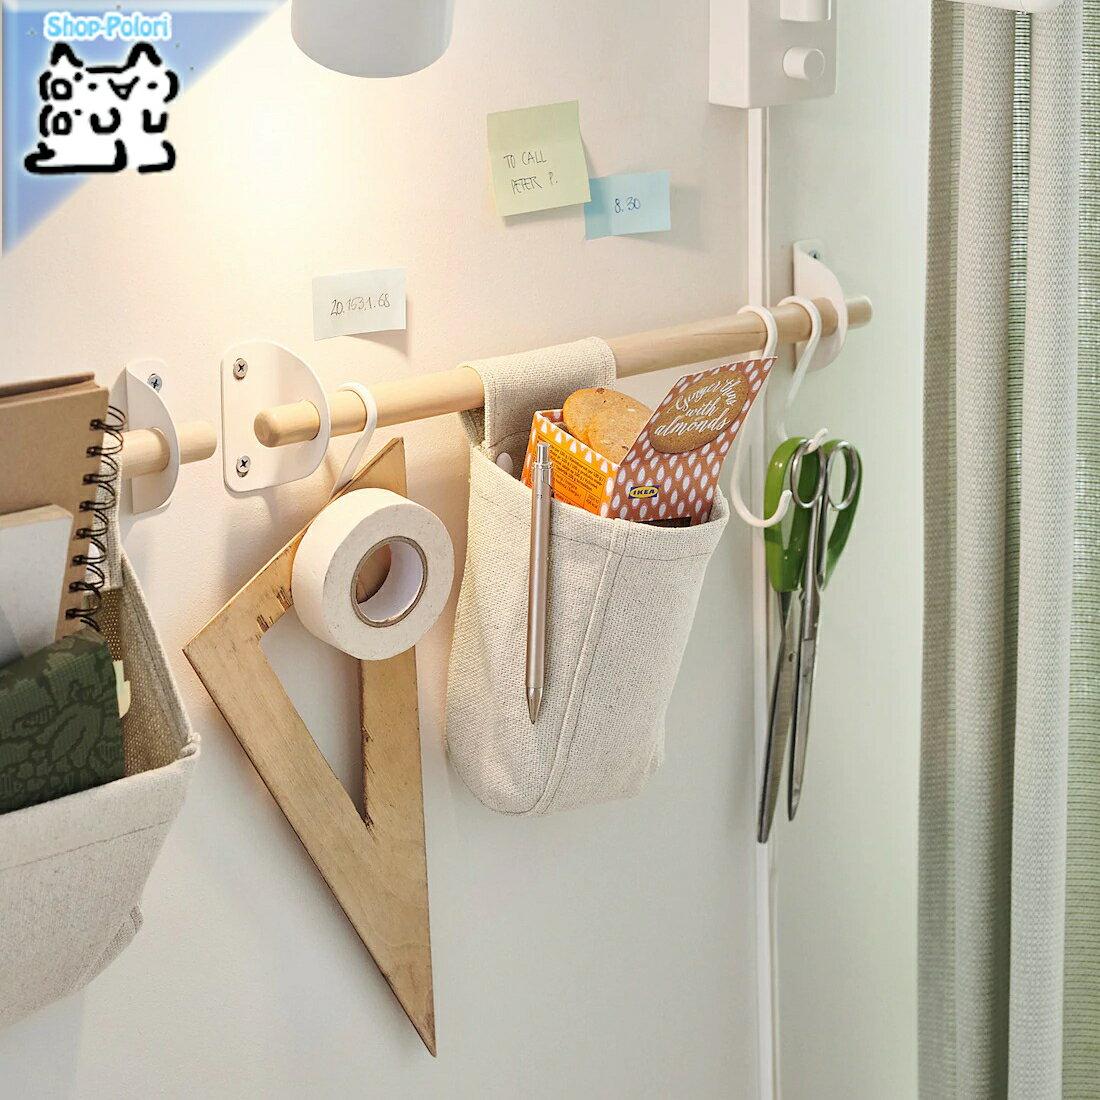 【IKEA Original】NEREBY -ネレビ- キッチン用収納 レール バーチ 40 cm